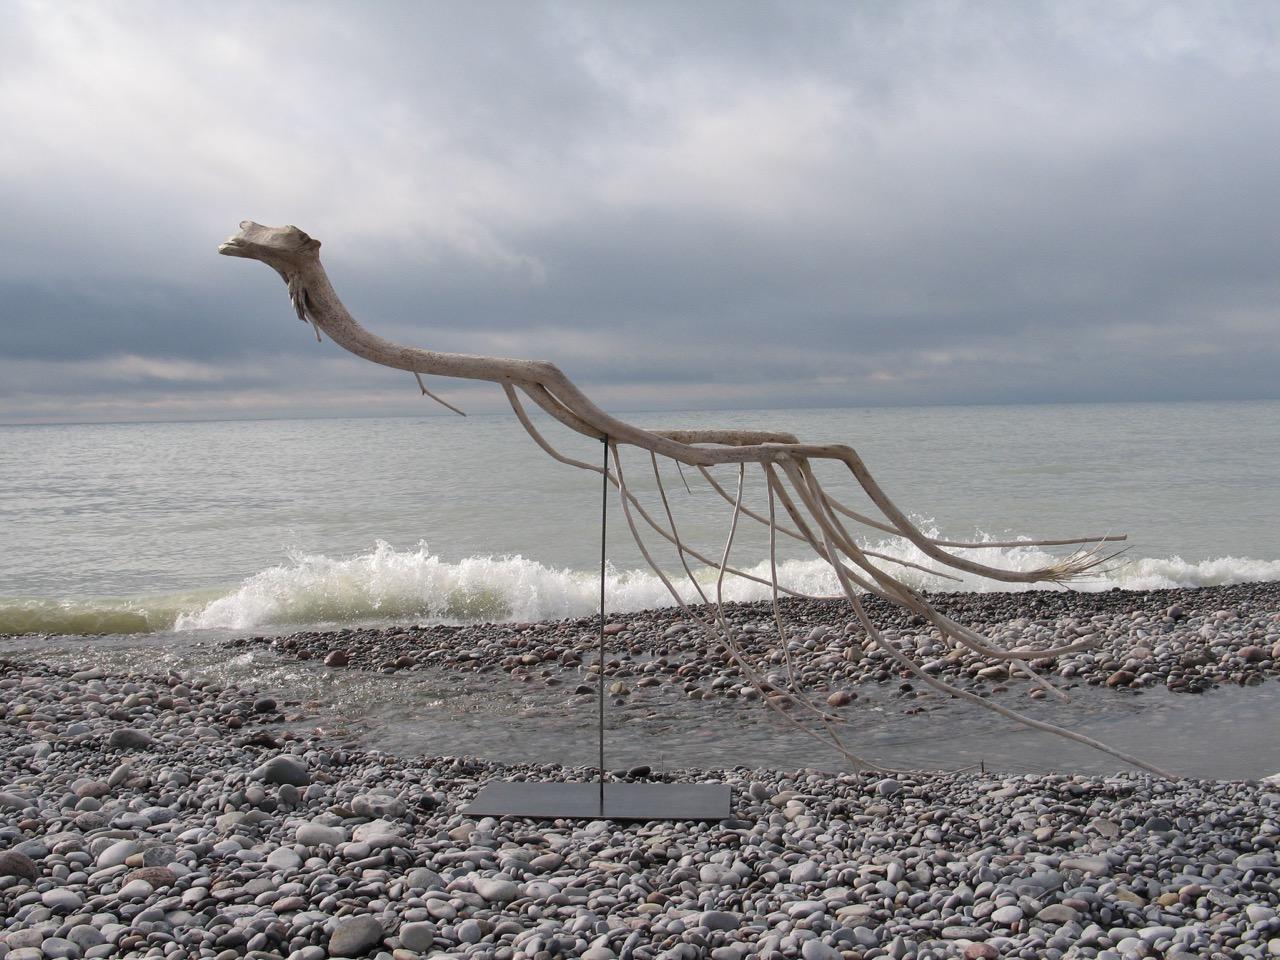 SALLY THURLOW,  Swimmer, 2011-12  Lake Ontario Driftwood, 148 x 240 x 74 cm